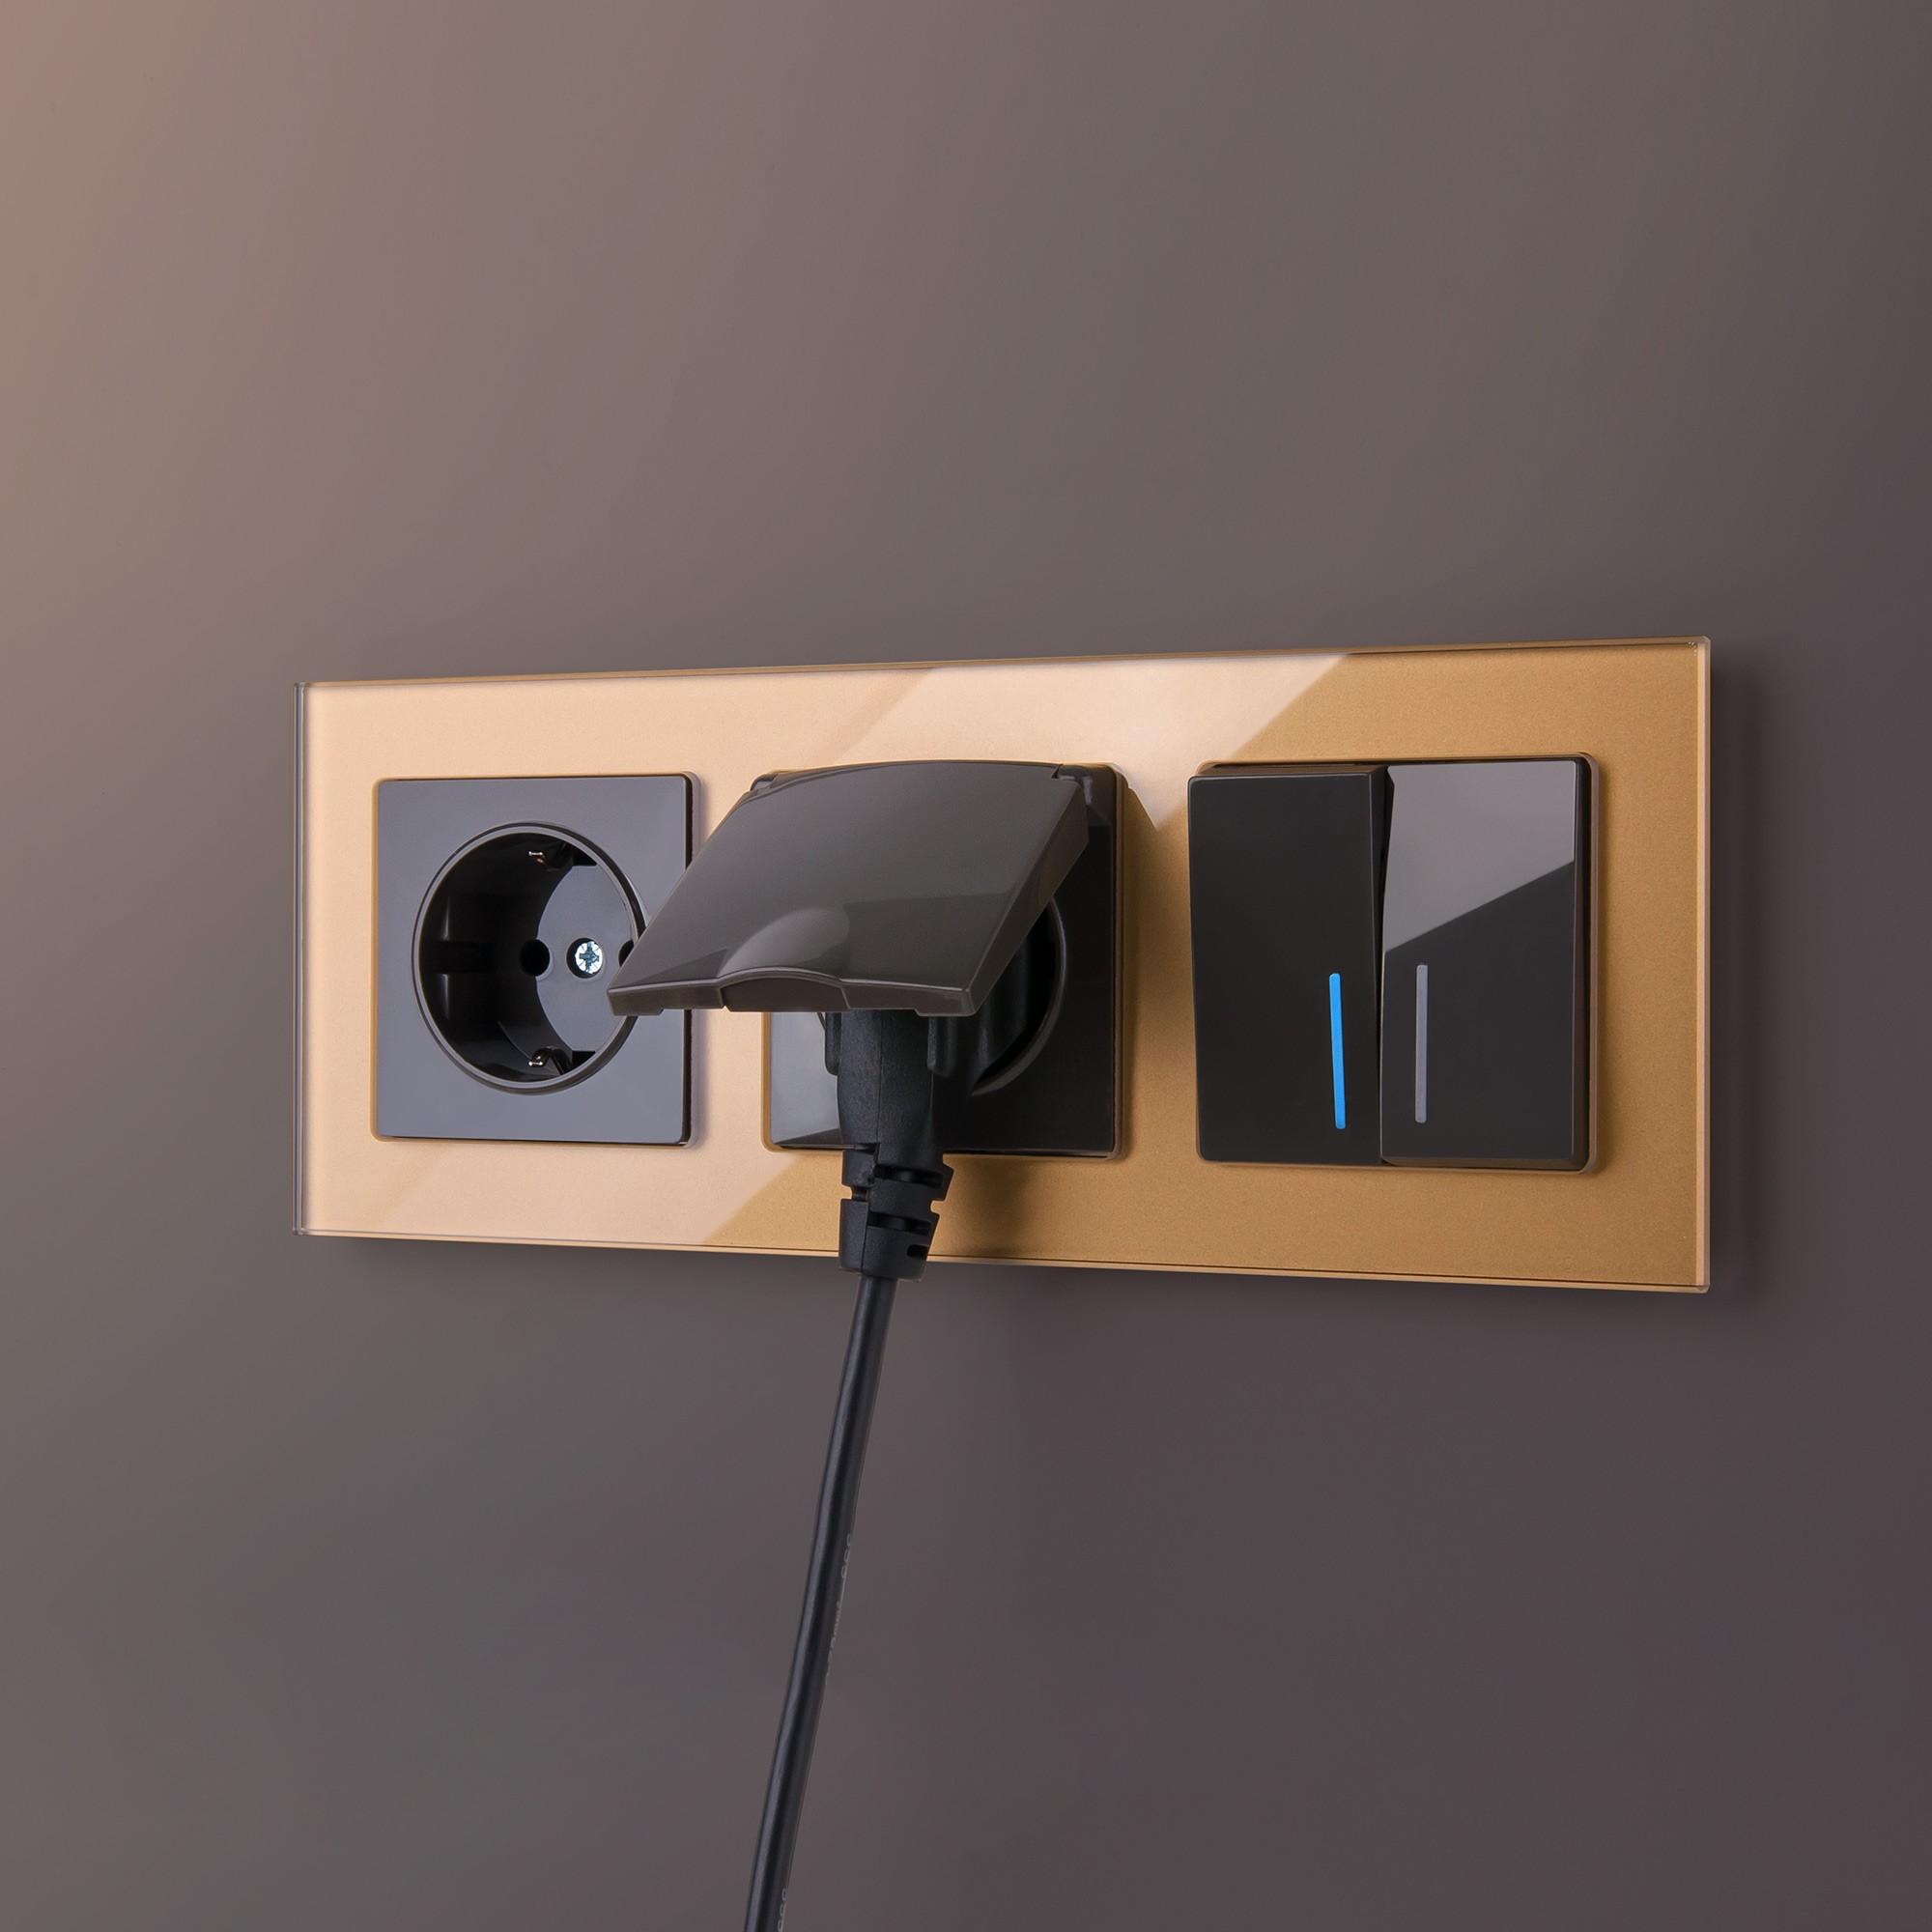 WL01-Frame-03 / Рамка на 3 поста (бронзовый,стекло)